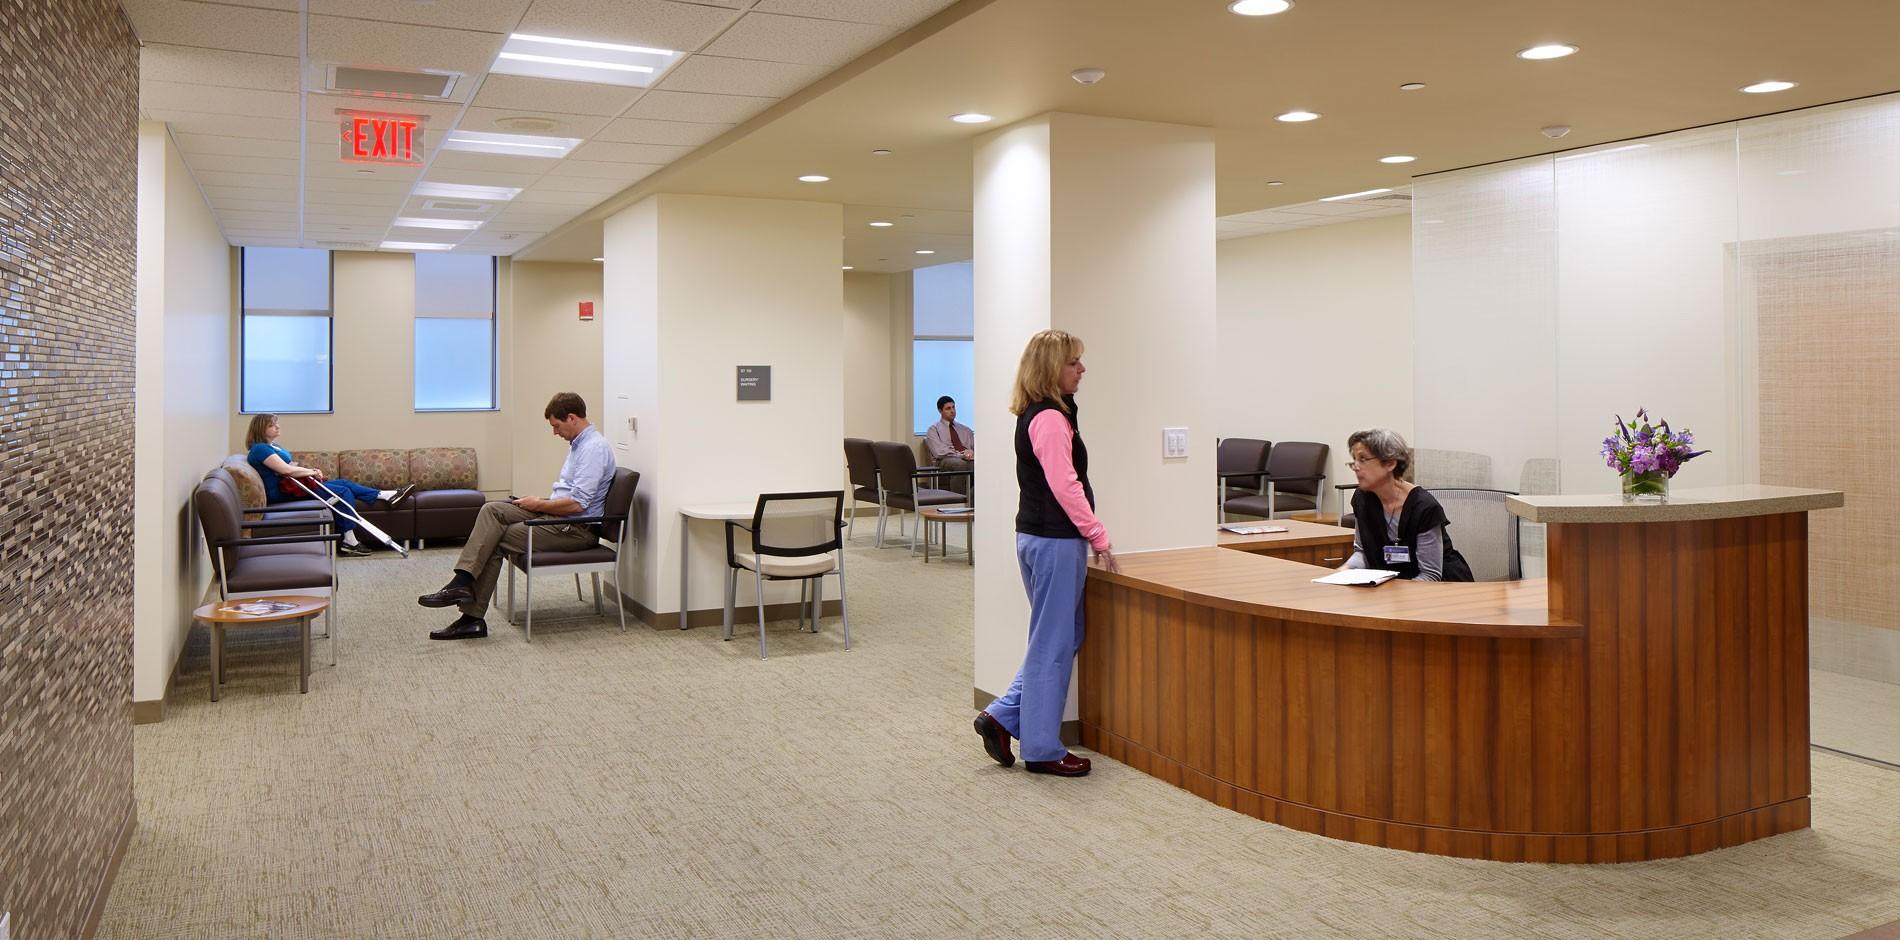 Beth Israel Deaconess Hospital Emergency Room